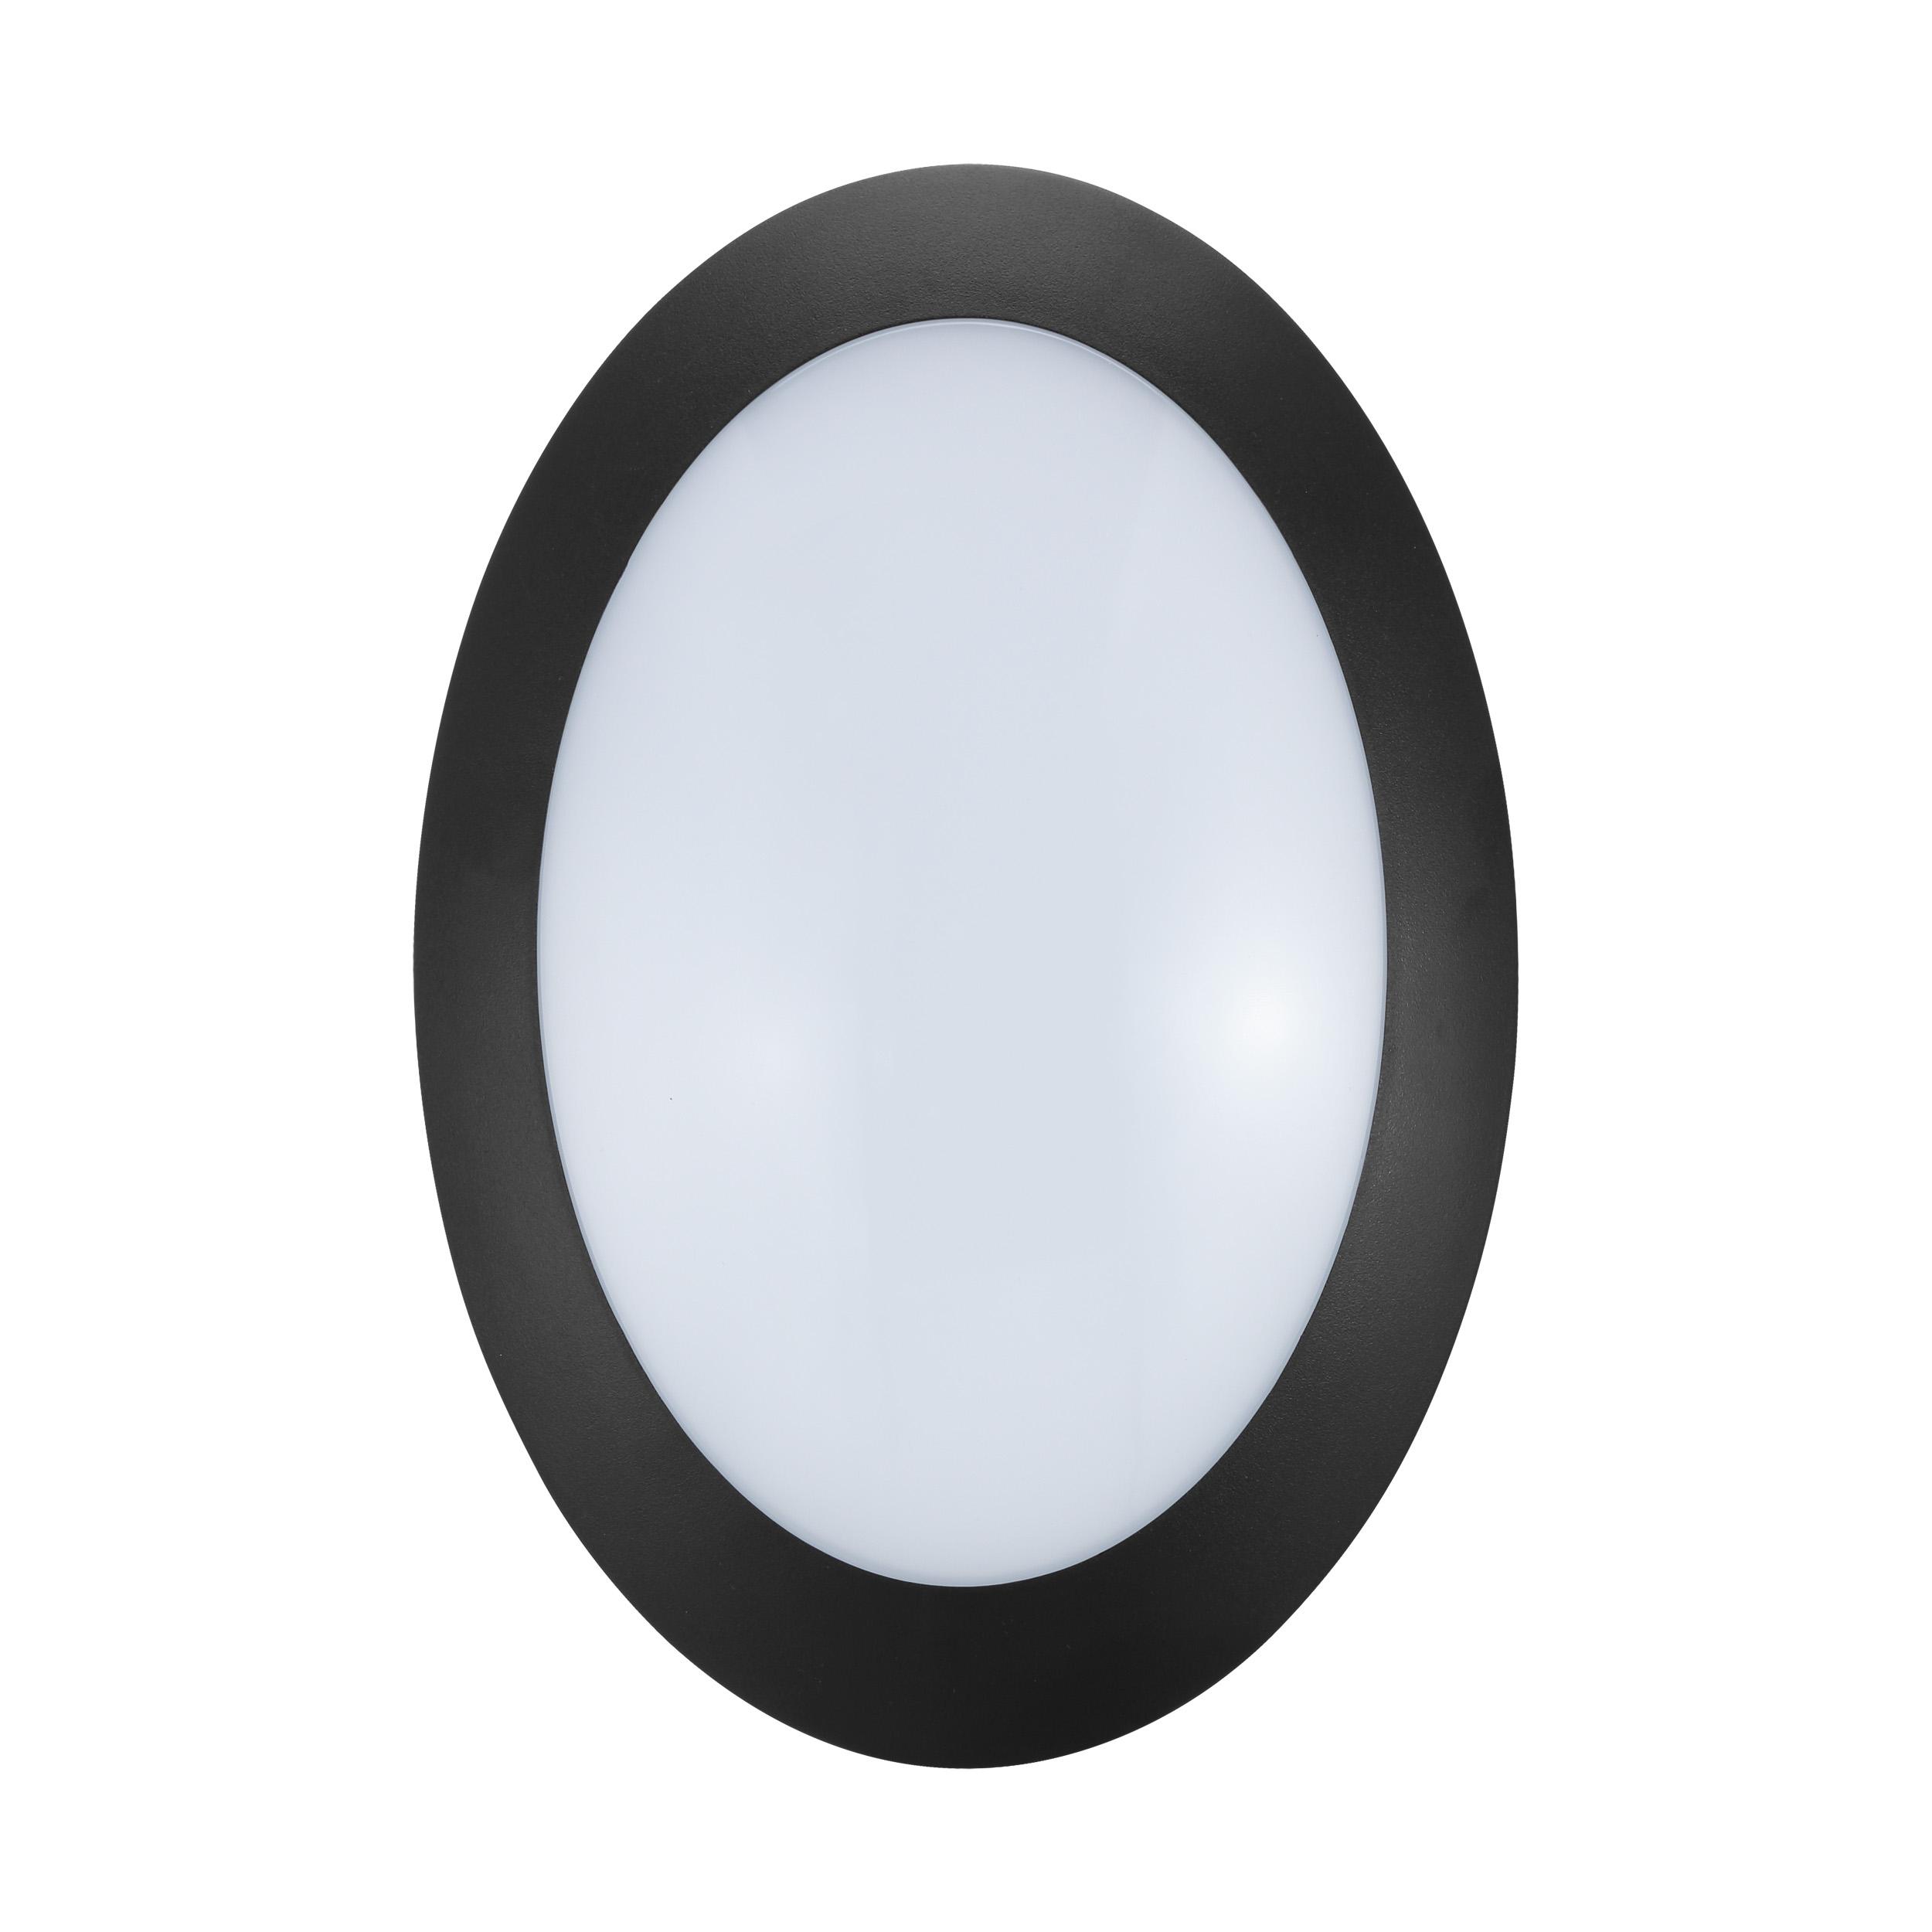 1 Stk Bellaria Wandaufbauleuchte oval 6W 3000K schwarz IP66 LI62212---